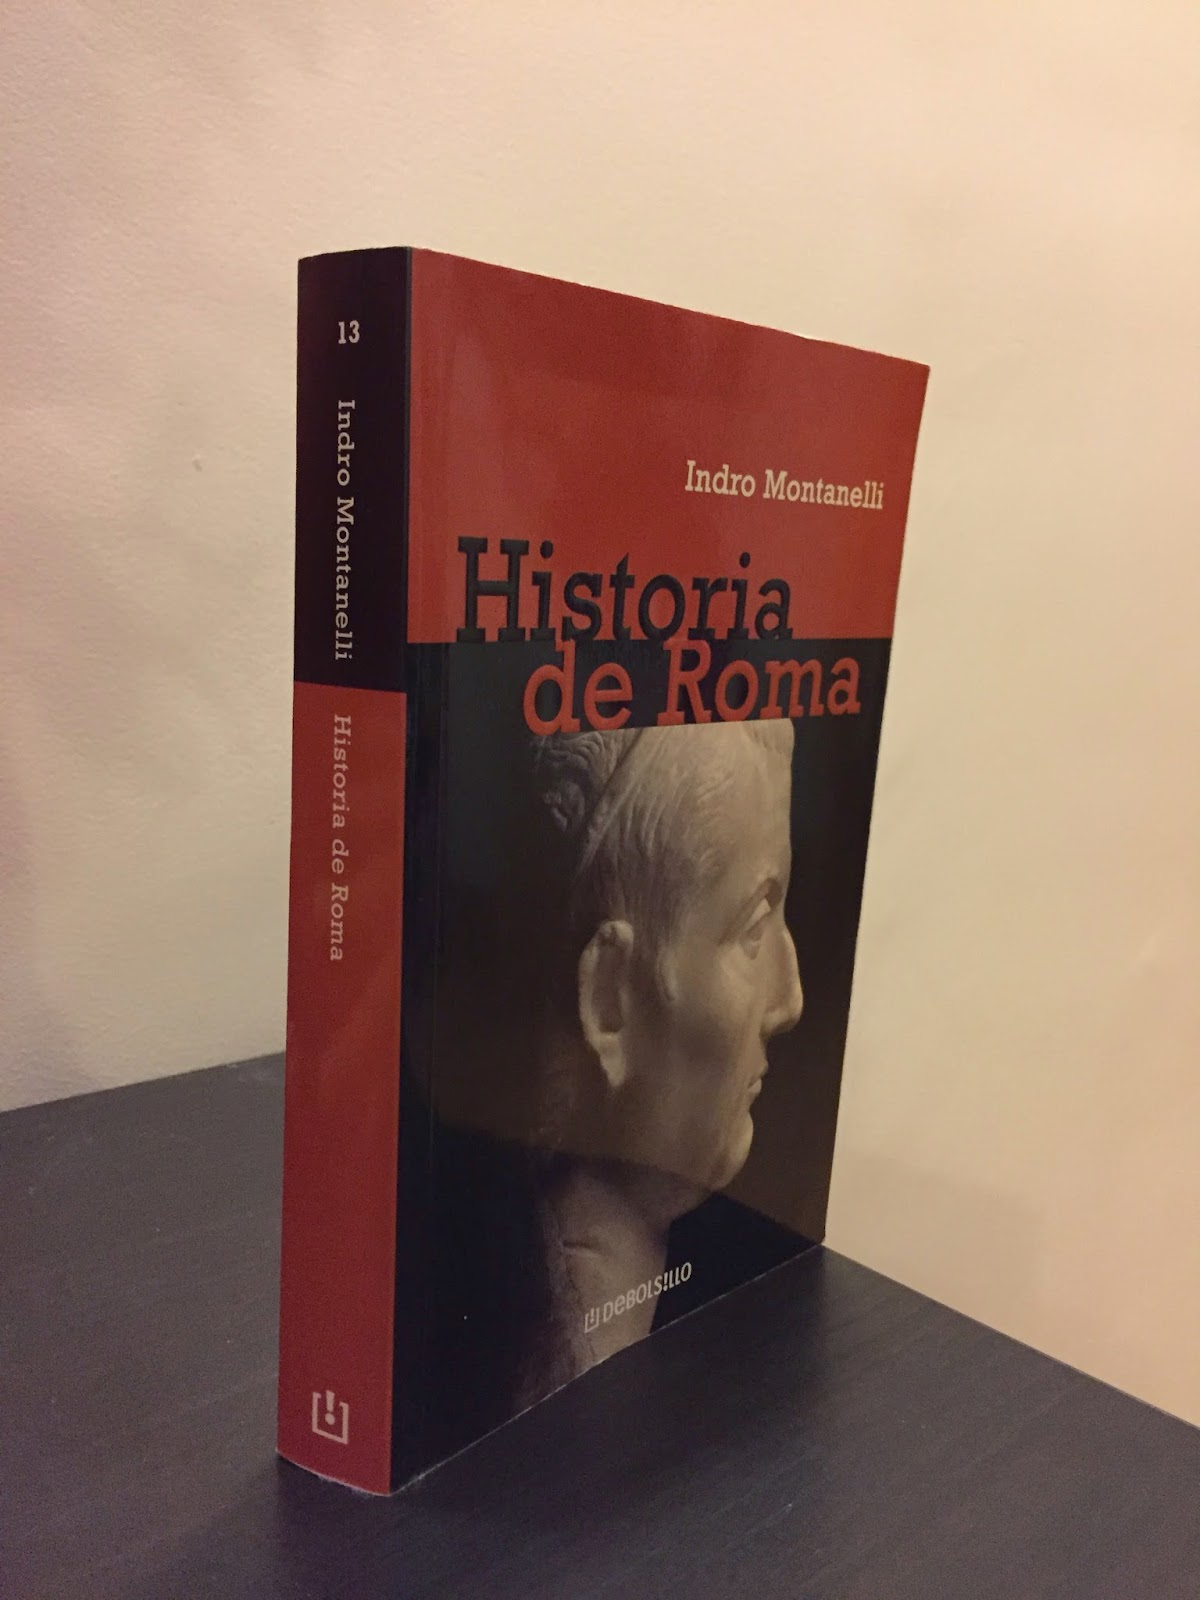 Libros belicos, Roma, Indro Montanelli